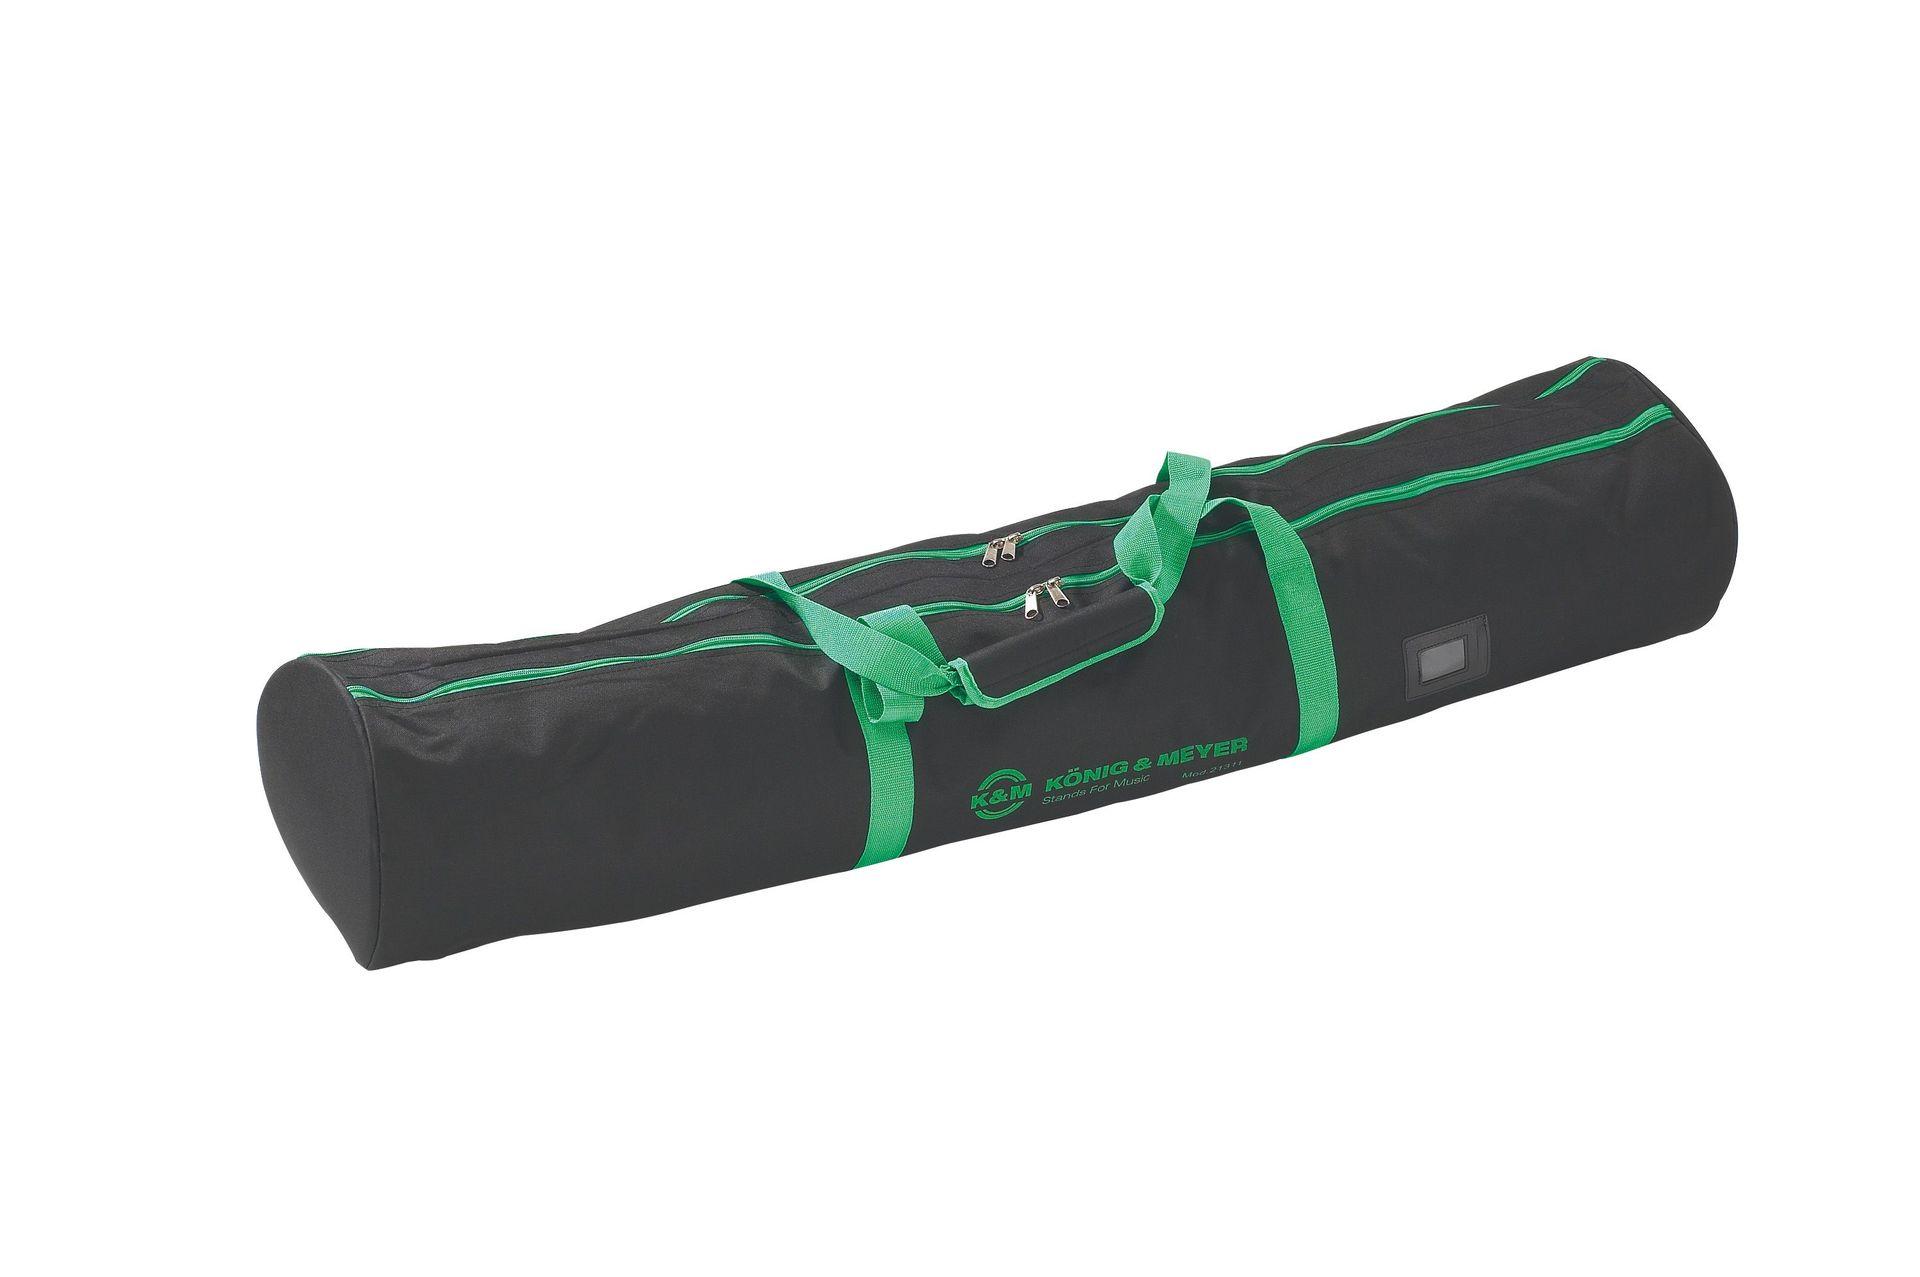 K&M 21311 Boxenstativ Tasche, Nylongewebe mit grünem K&M-Logo für 2 Stative